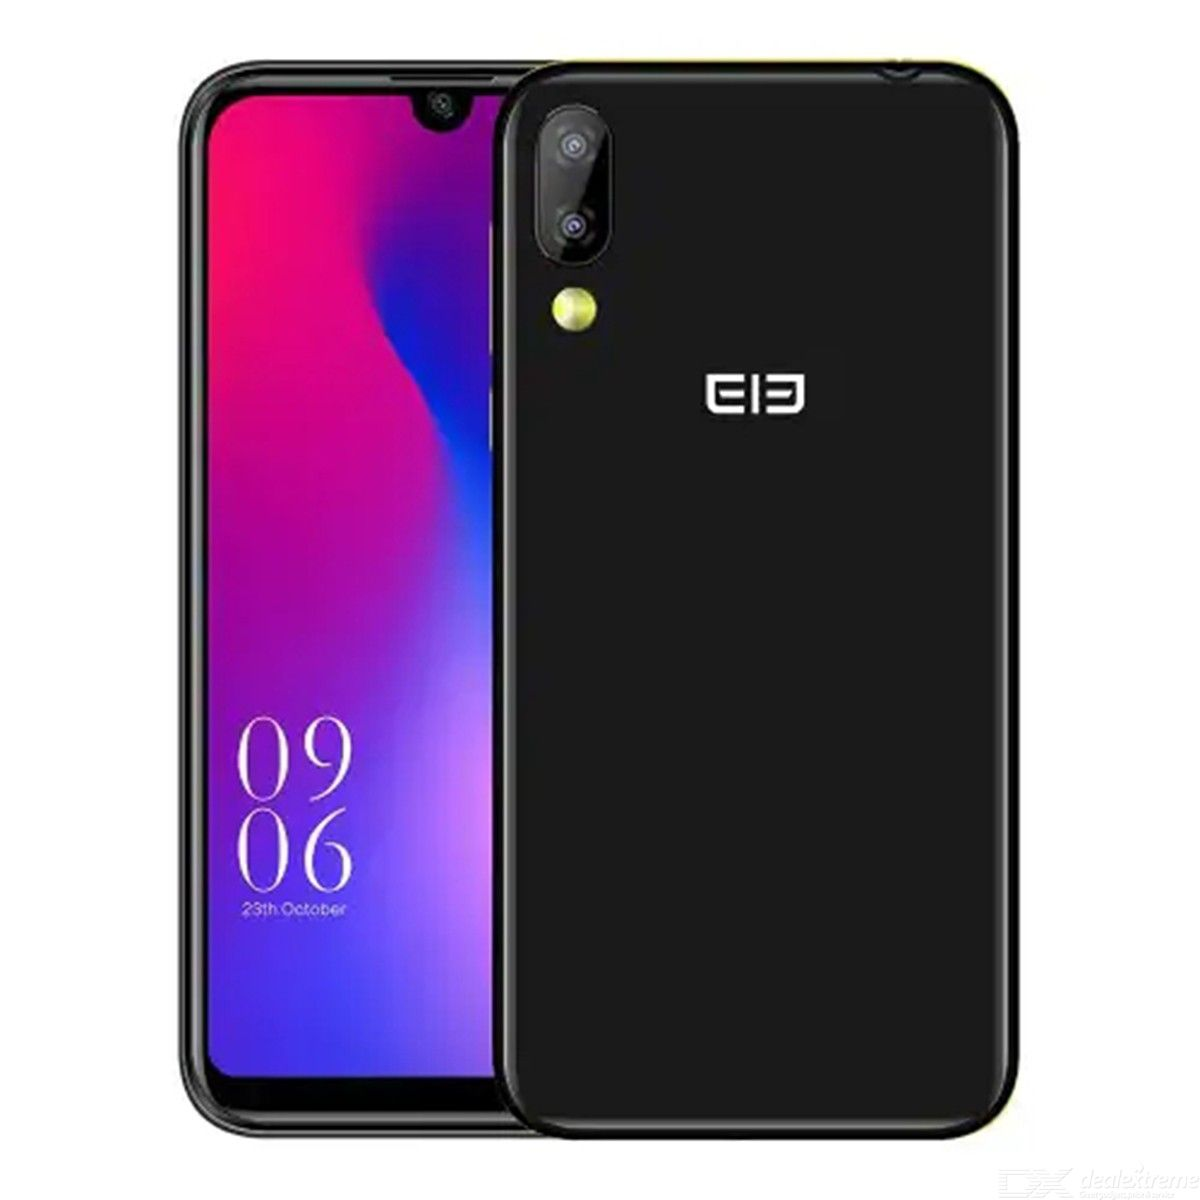 Elephone-A6-Mini-571-Inch-Phablet-16MP-2b2MP-Rear-Cameras-4GB-2b-32GB-249999-2b-Free-Shipping